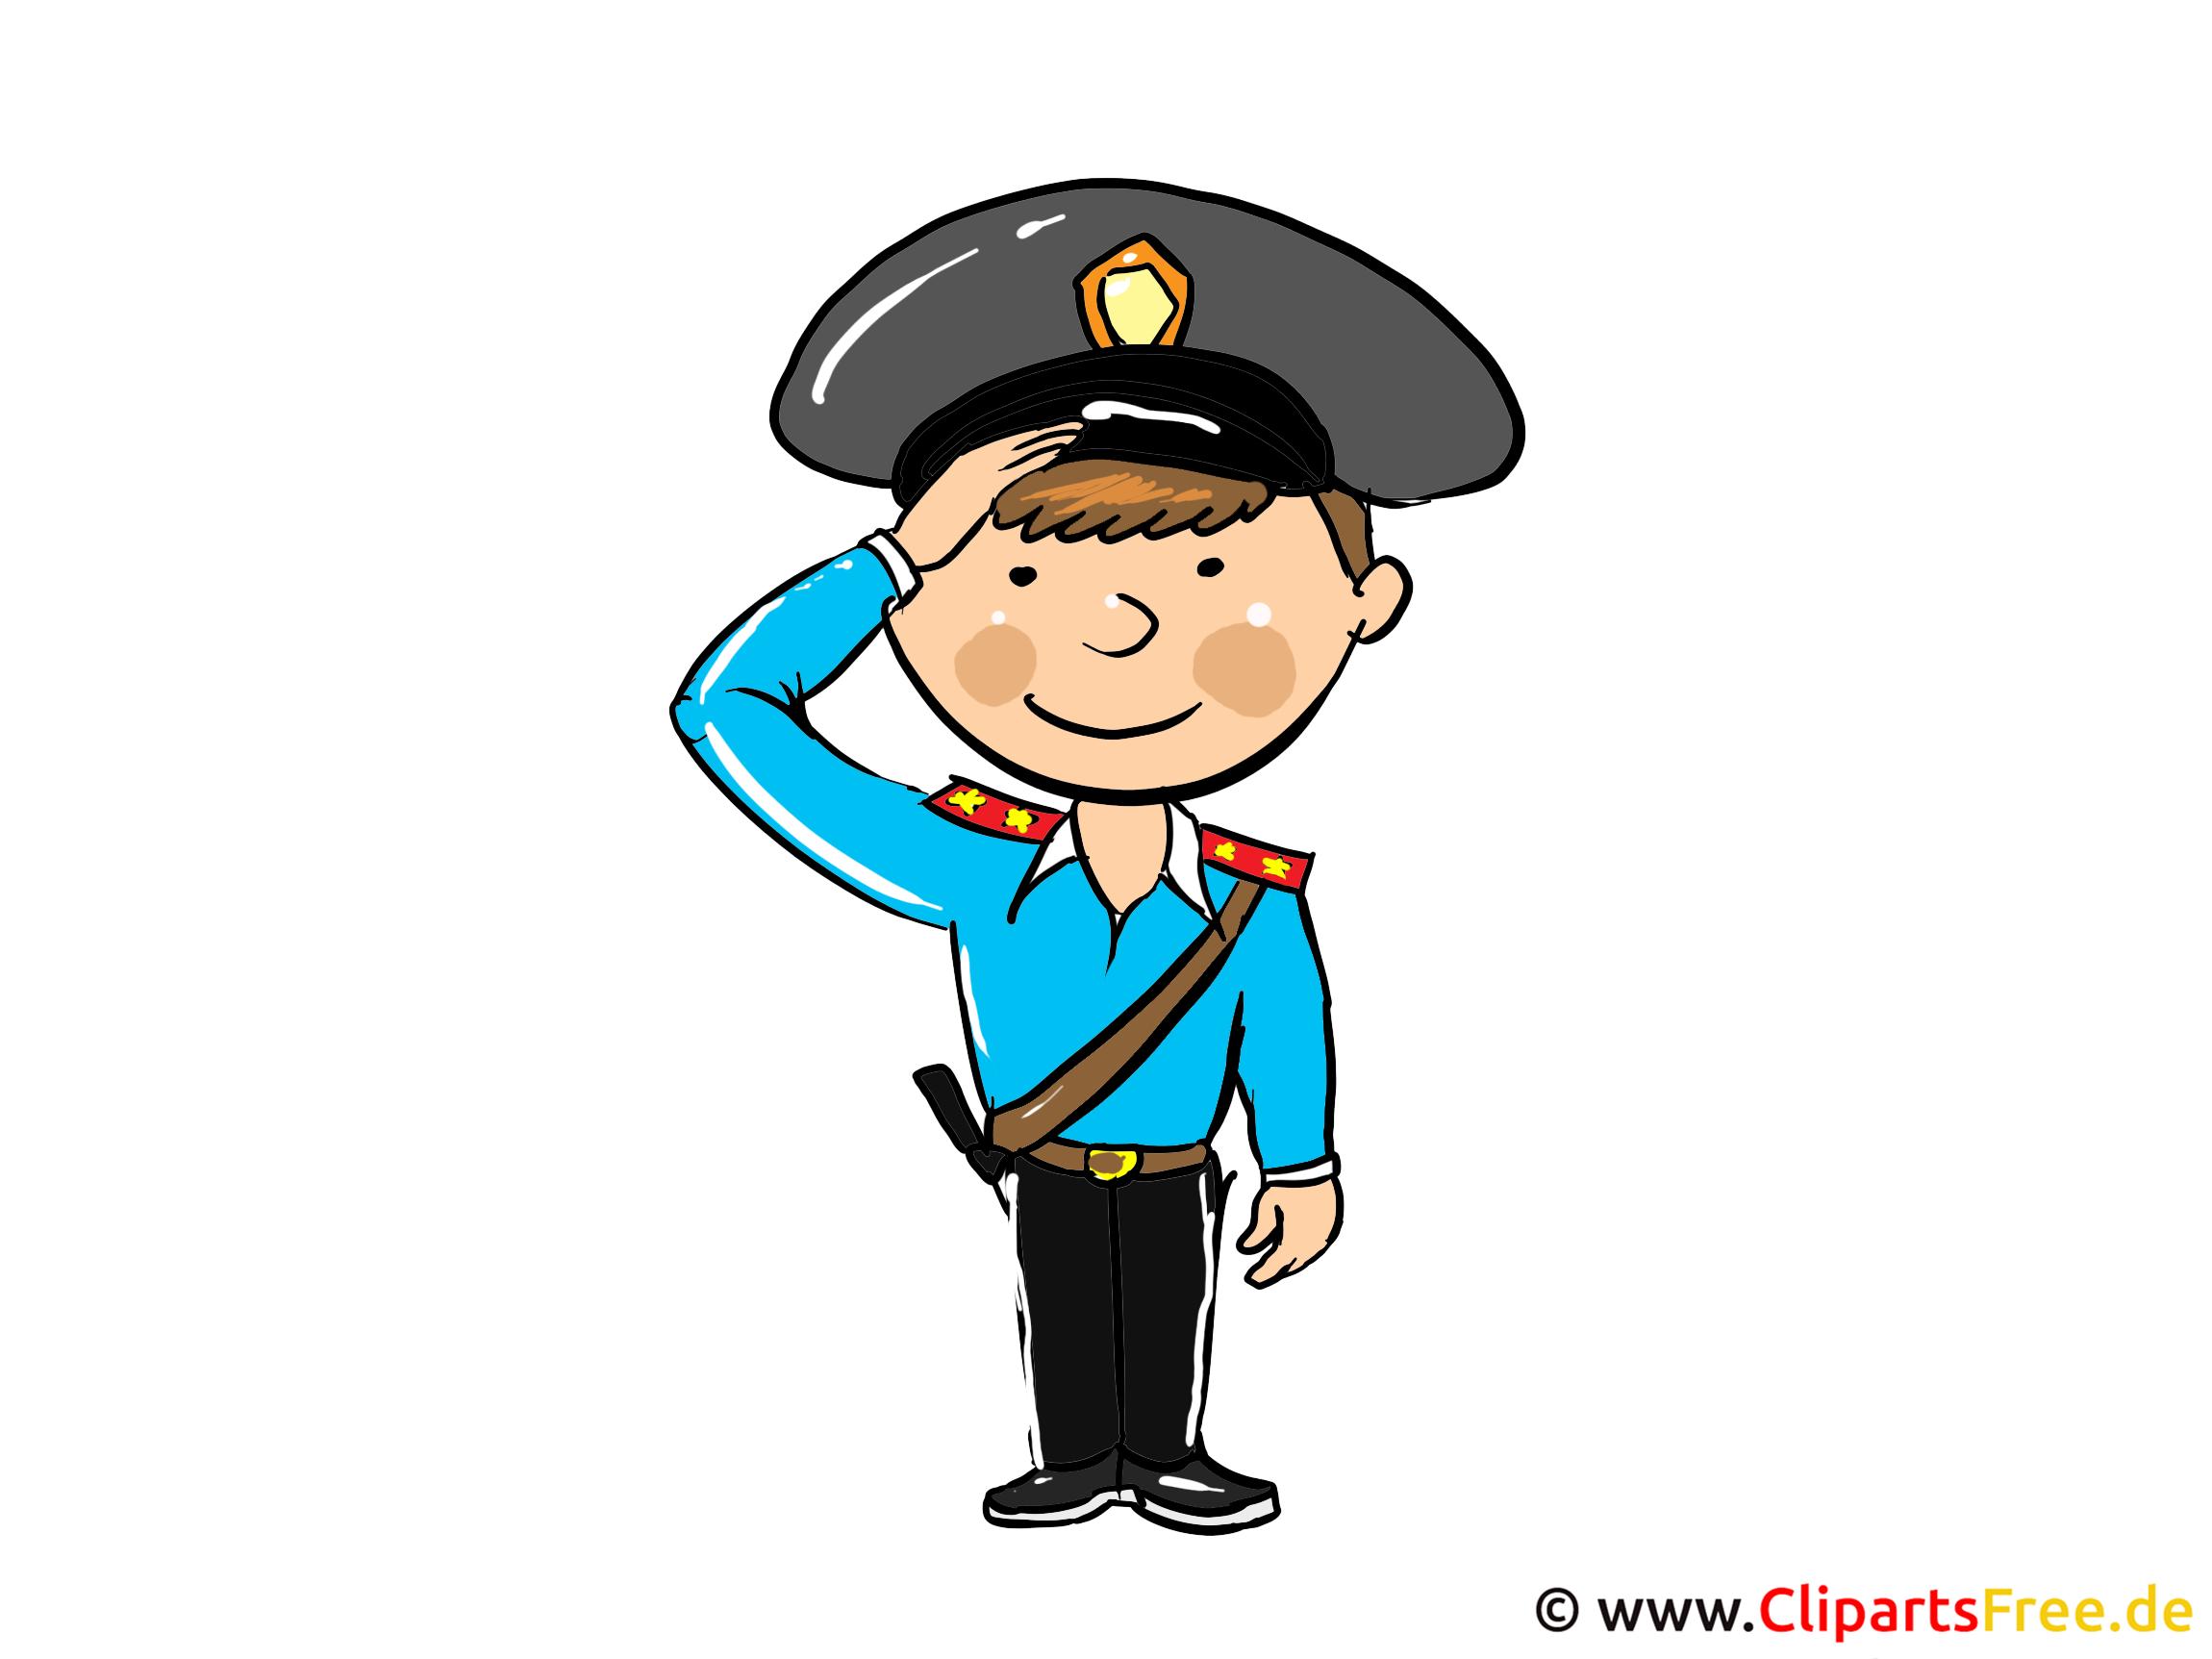 Polizist Clipart, Bild, Cartoon, Illustration kostenlos